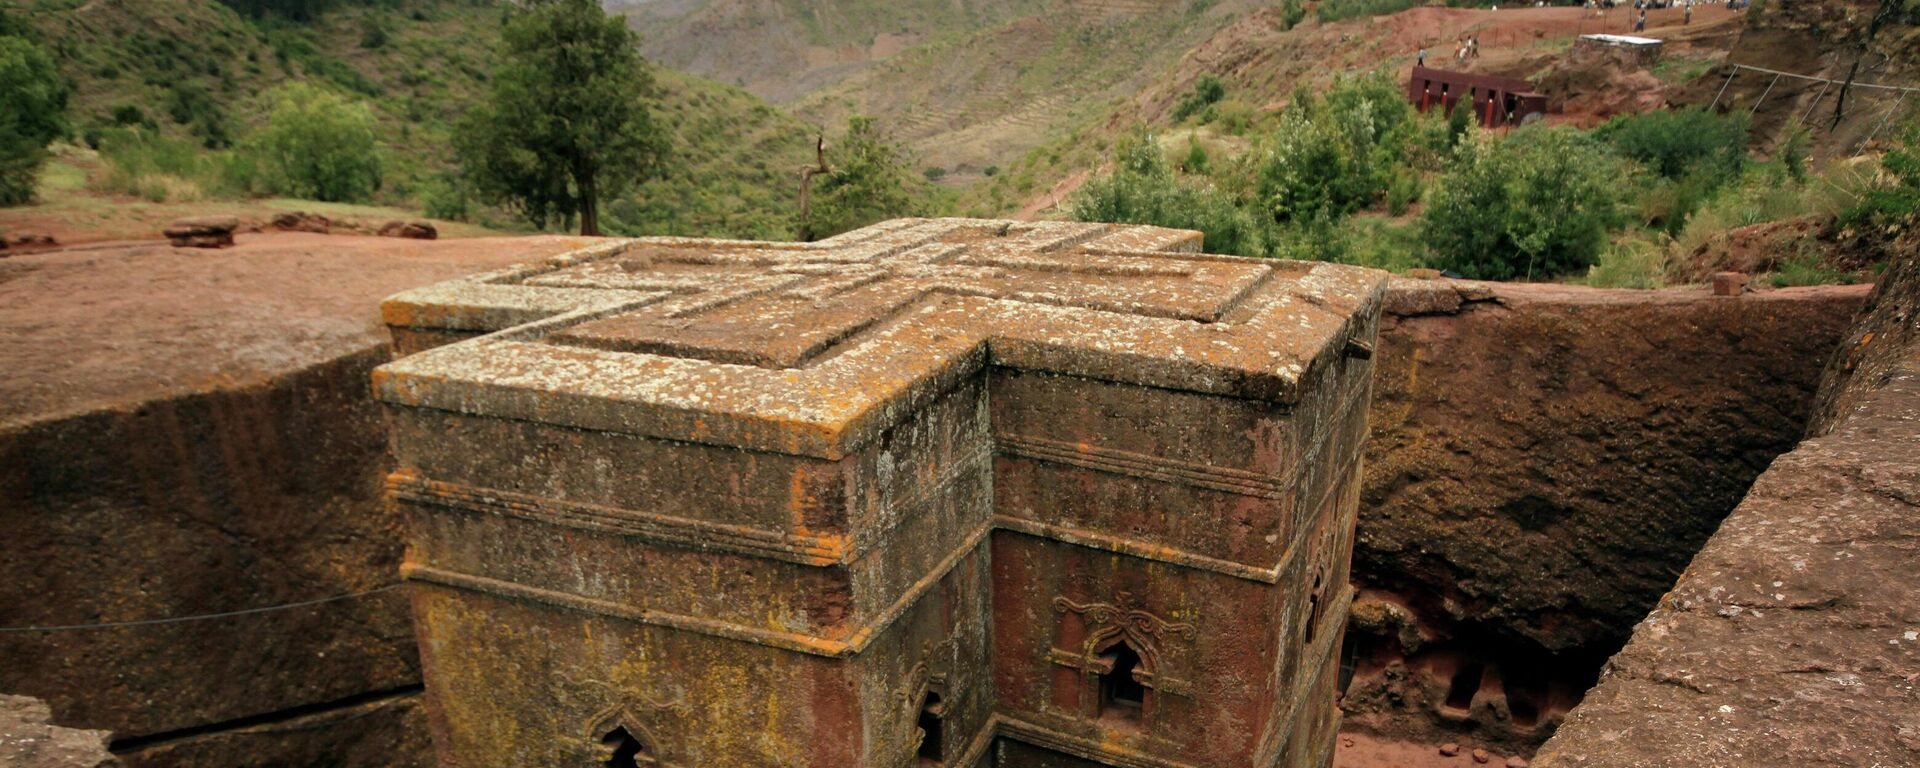 Unesco-Welterbestätte Lalibela in Äthiopien - SNA, 1920, 06.08.2021